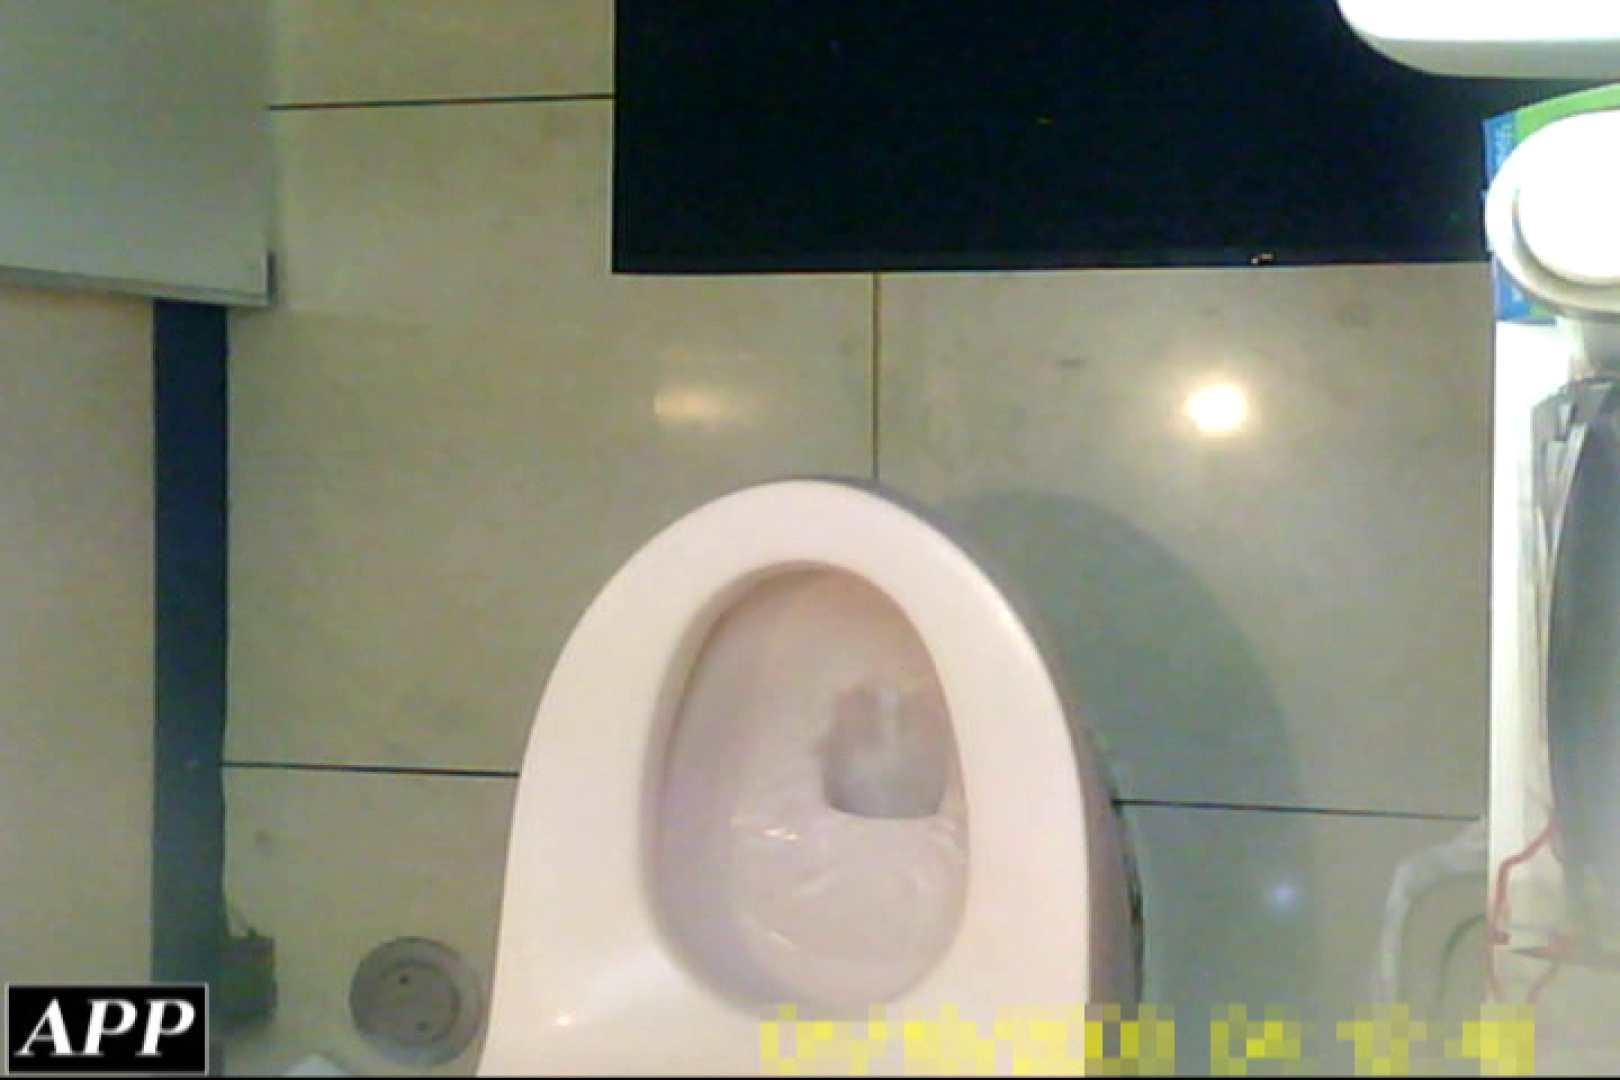 3視点洗面所 vol.127 OLハメ撮り  22Pix 6